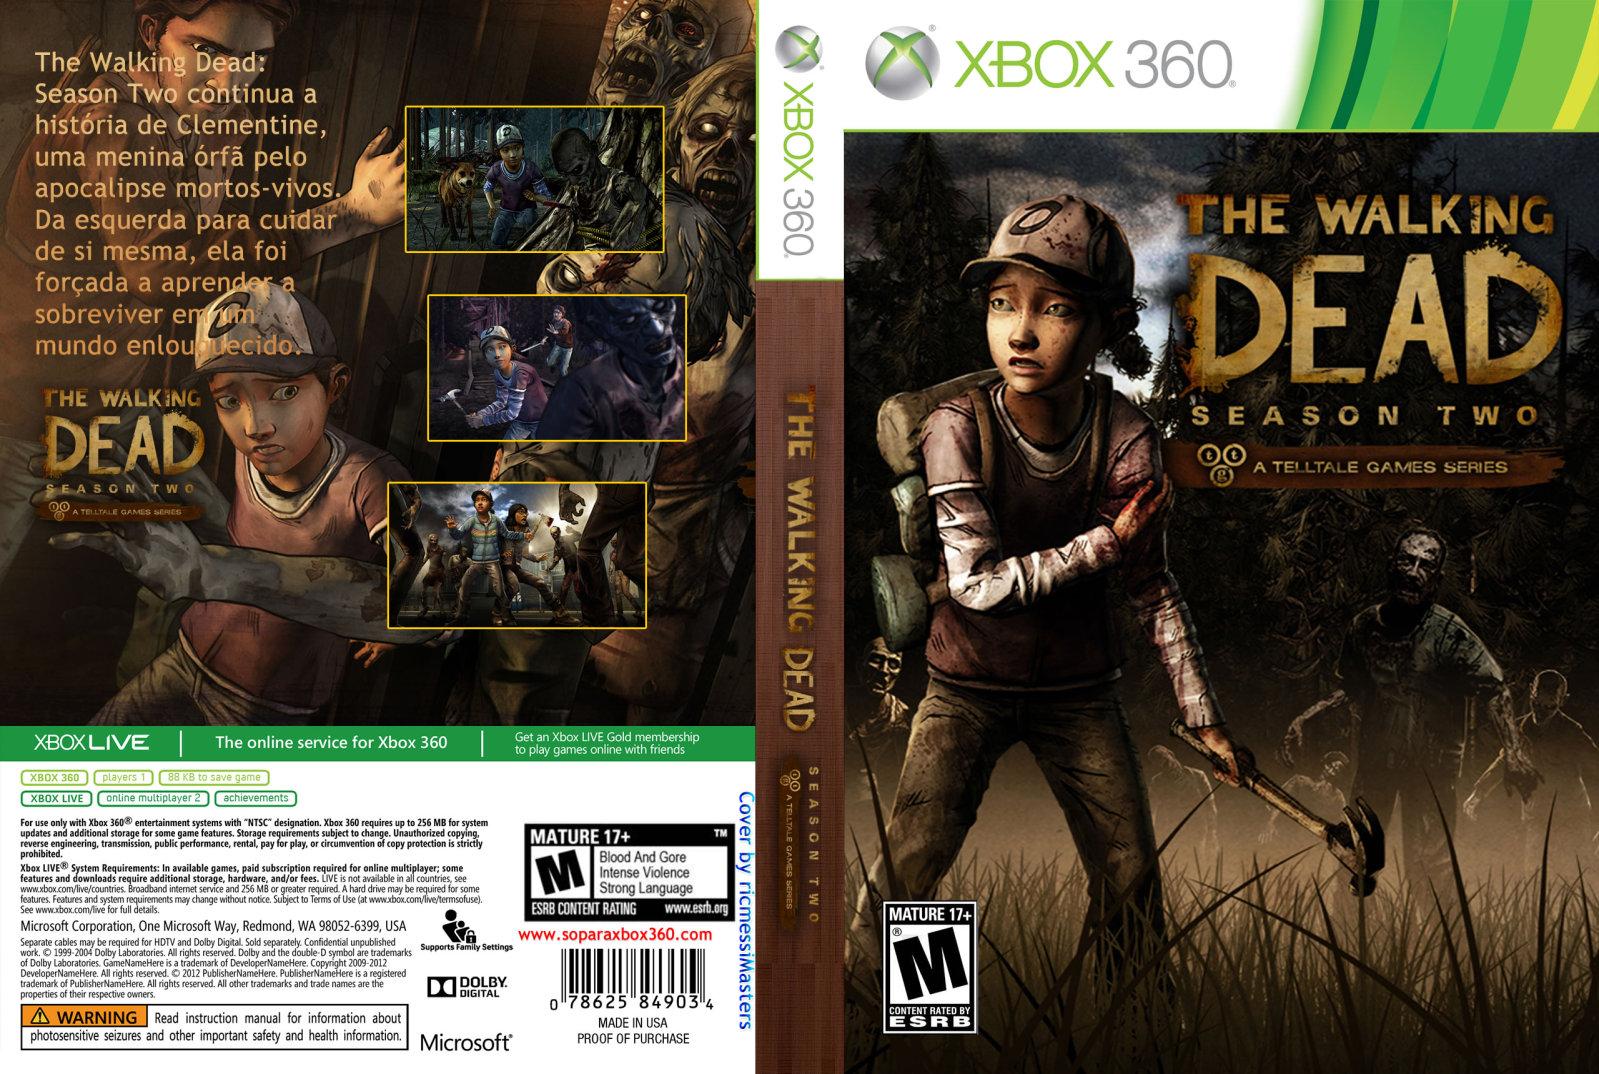 Rgh360ltu Xbox 360 The Walking Dead Season 2